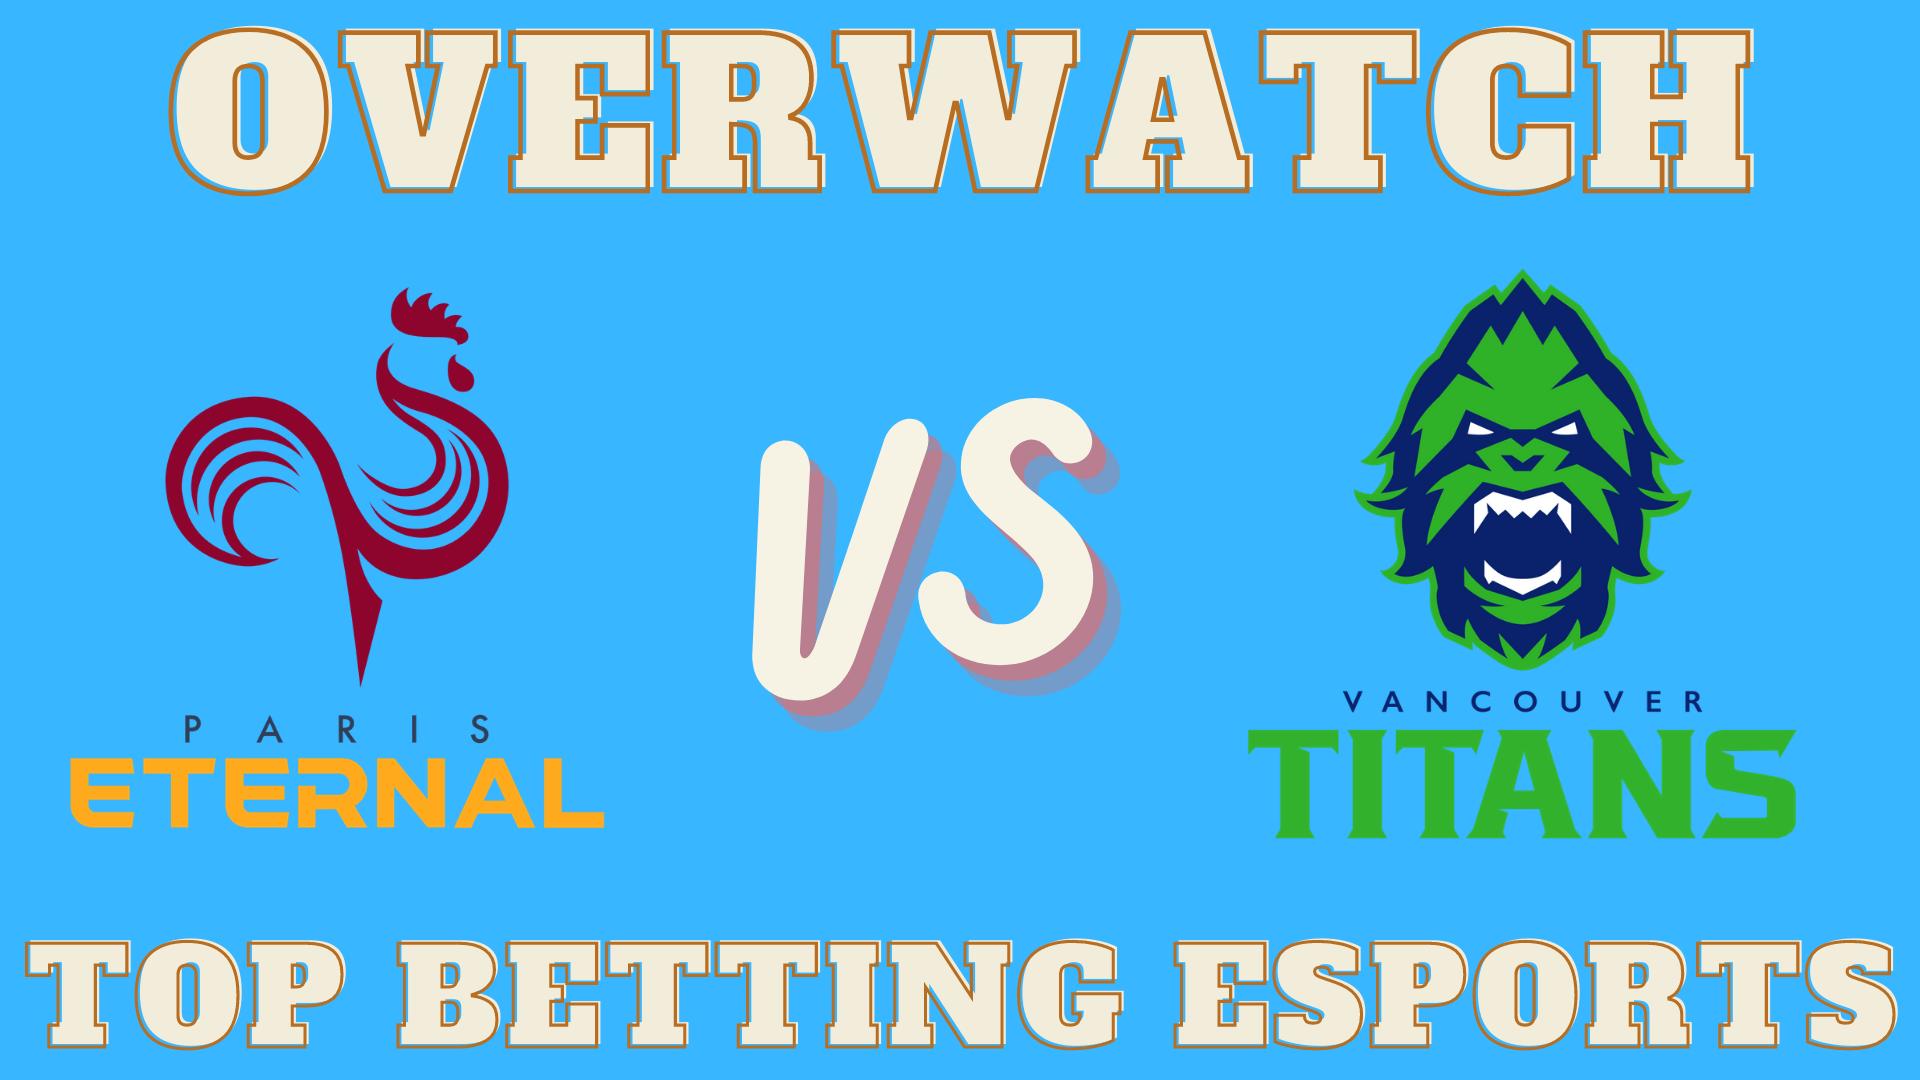 Overwatch Paris Eternal vs Vancouver Titans Betting prediction